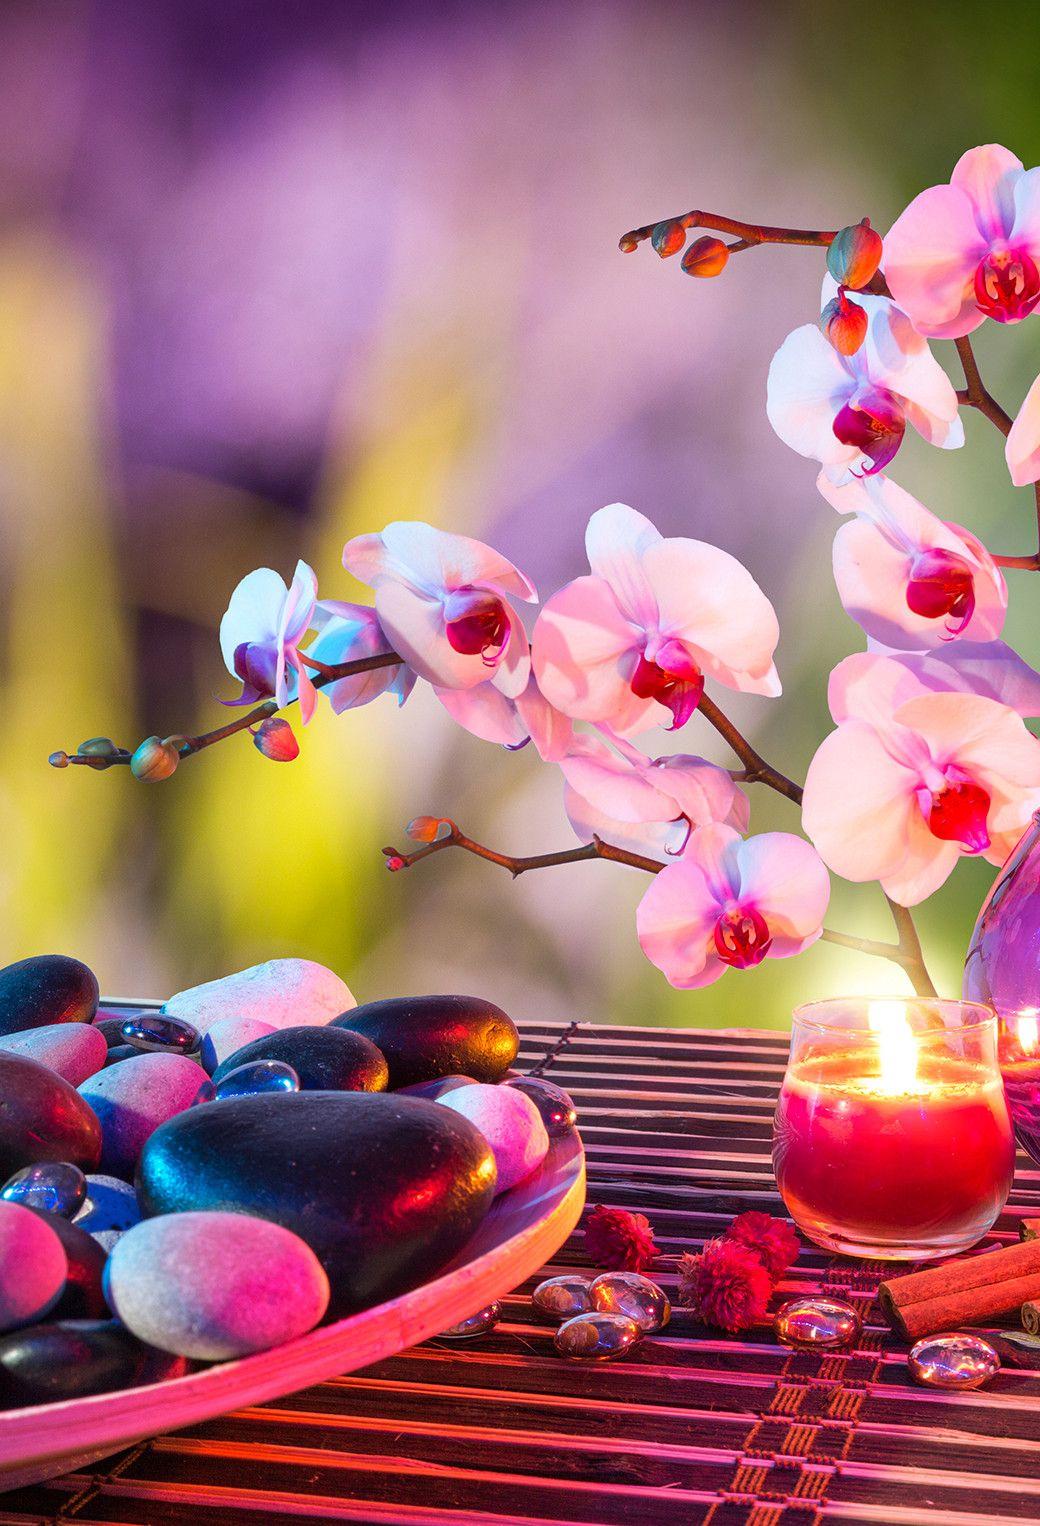 Fond D Cran Zen Attitude Avec Hd Iphone X 8 7 6 Zen Attitude Free Idees Et Zen Attitude 3wallpapers Iphone Par Fond Ecran Zen Paysage Zen Fond D Ecran Orchidee